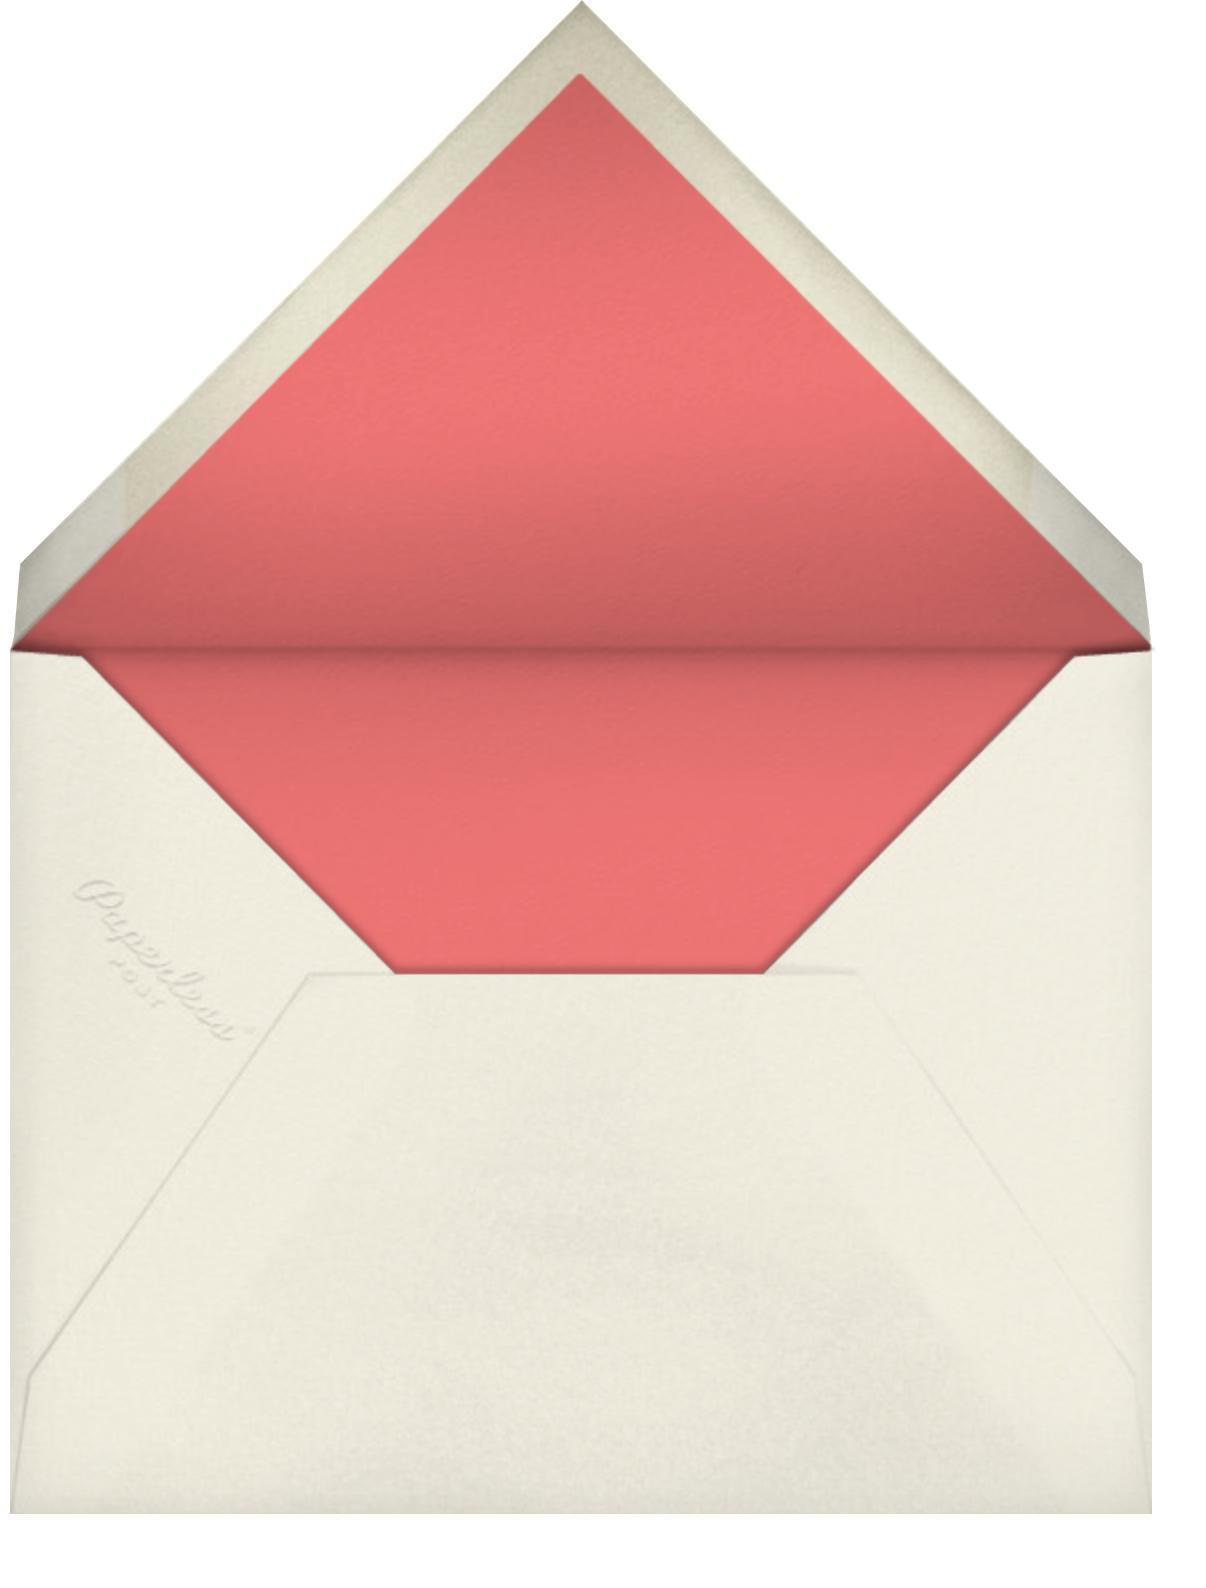 Petit Jardin - Coral - Anthropologie - Envelope